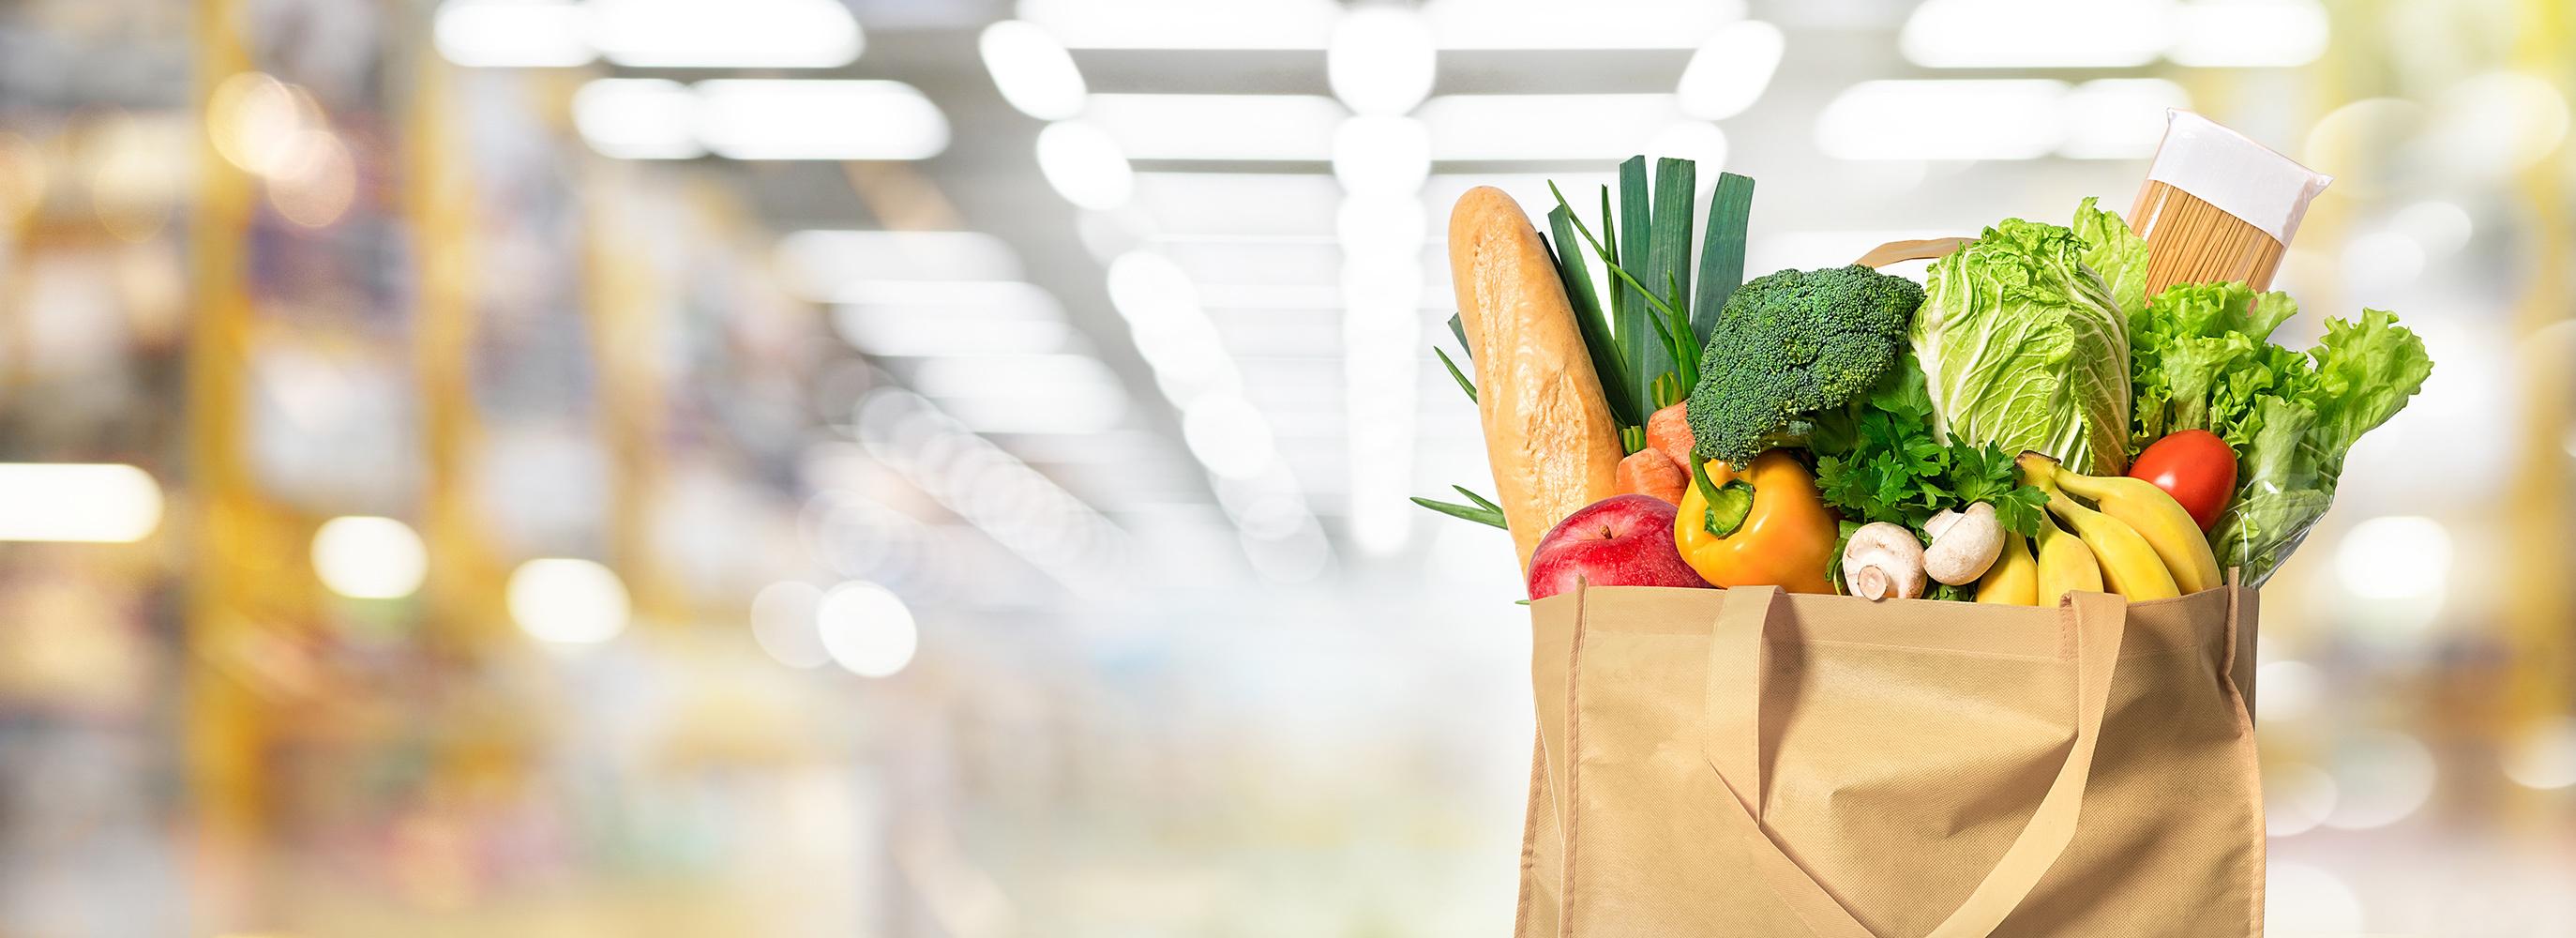 Sainsbury's and Asda proposed merger